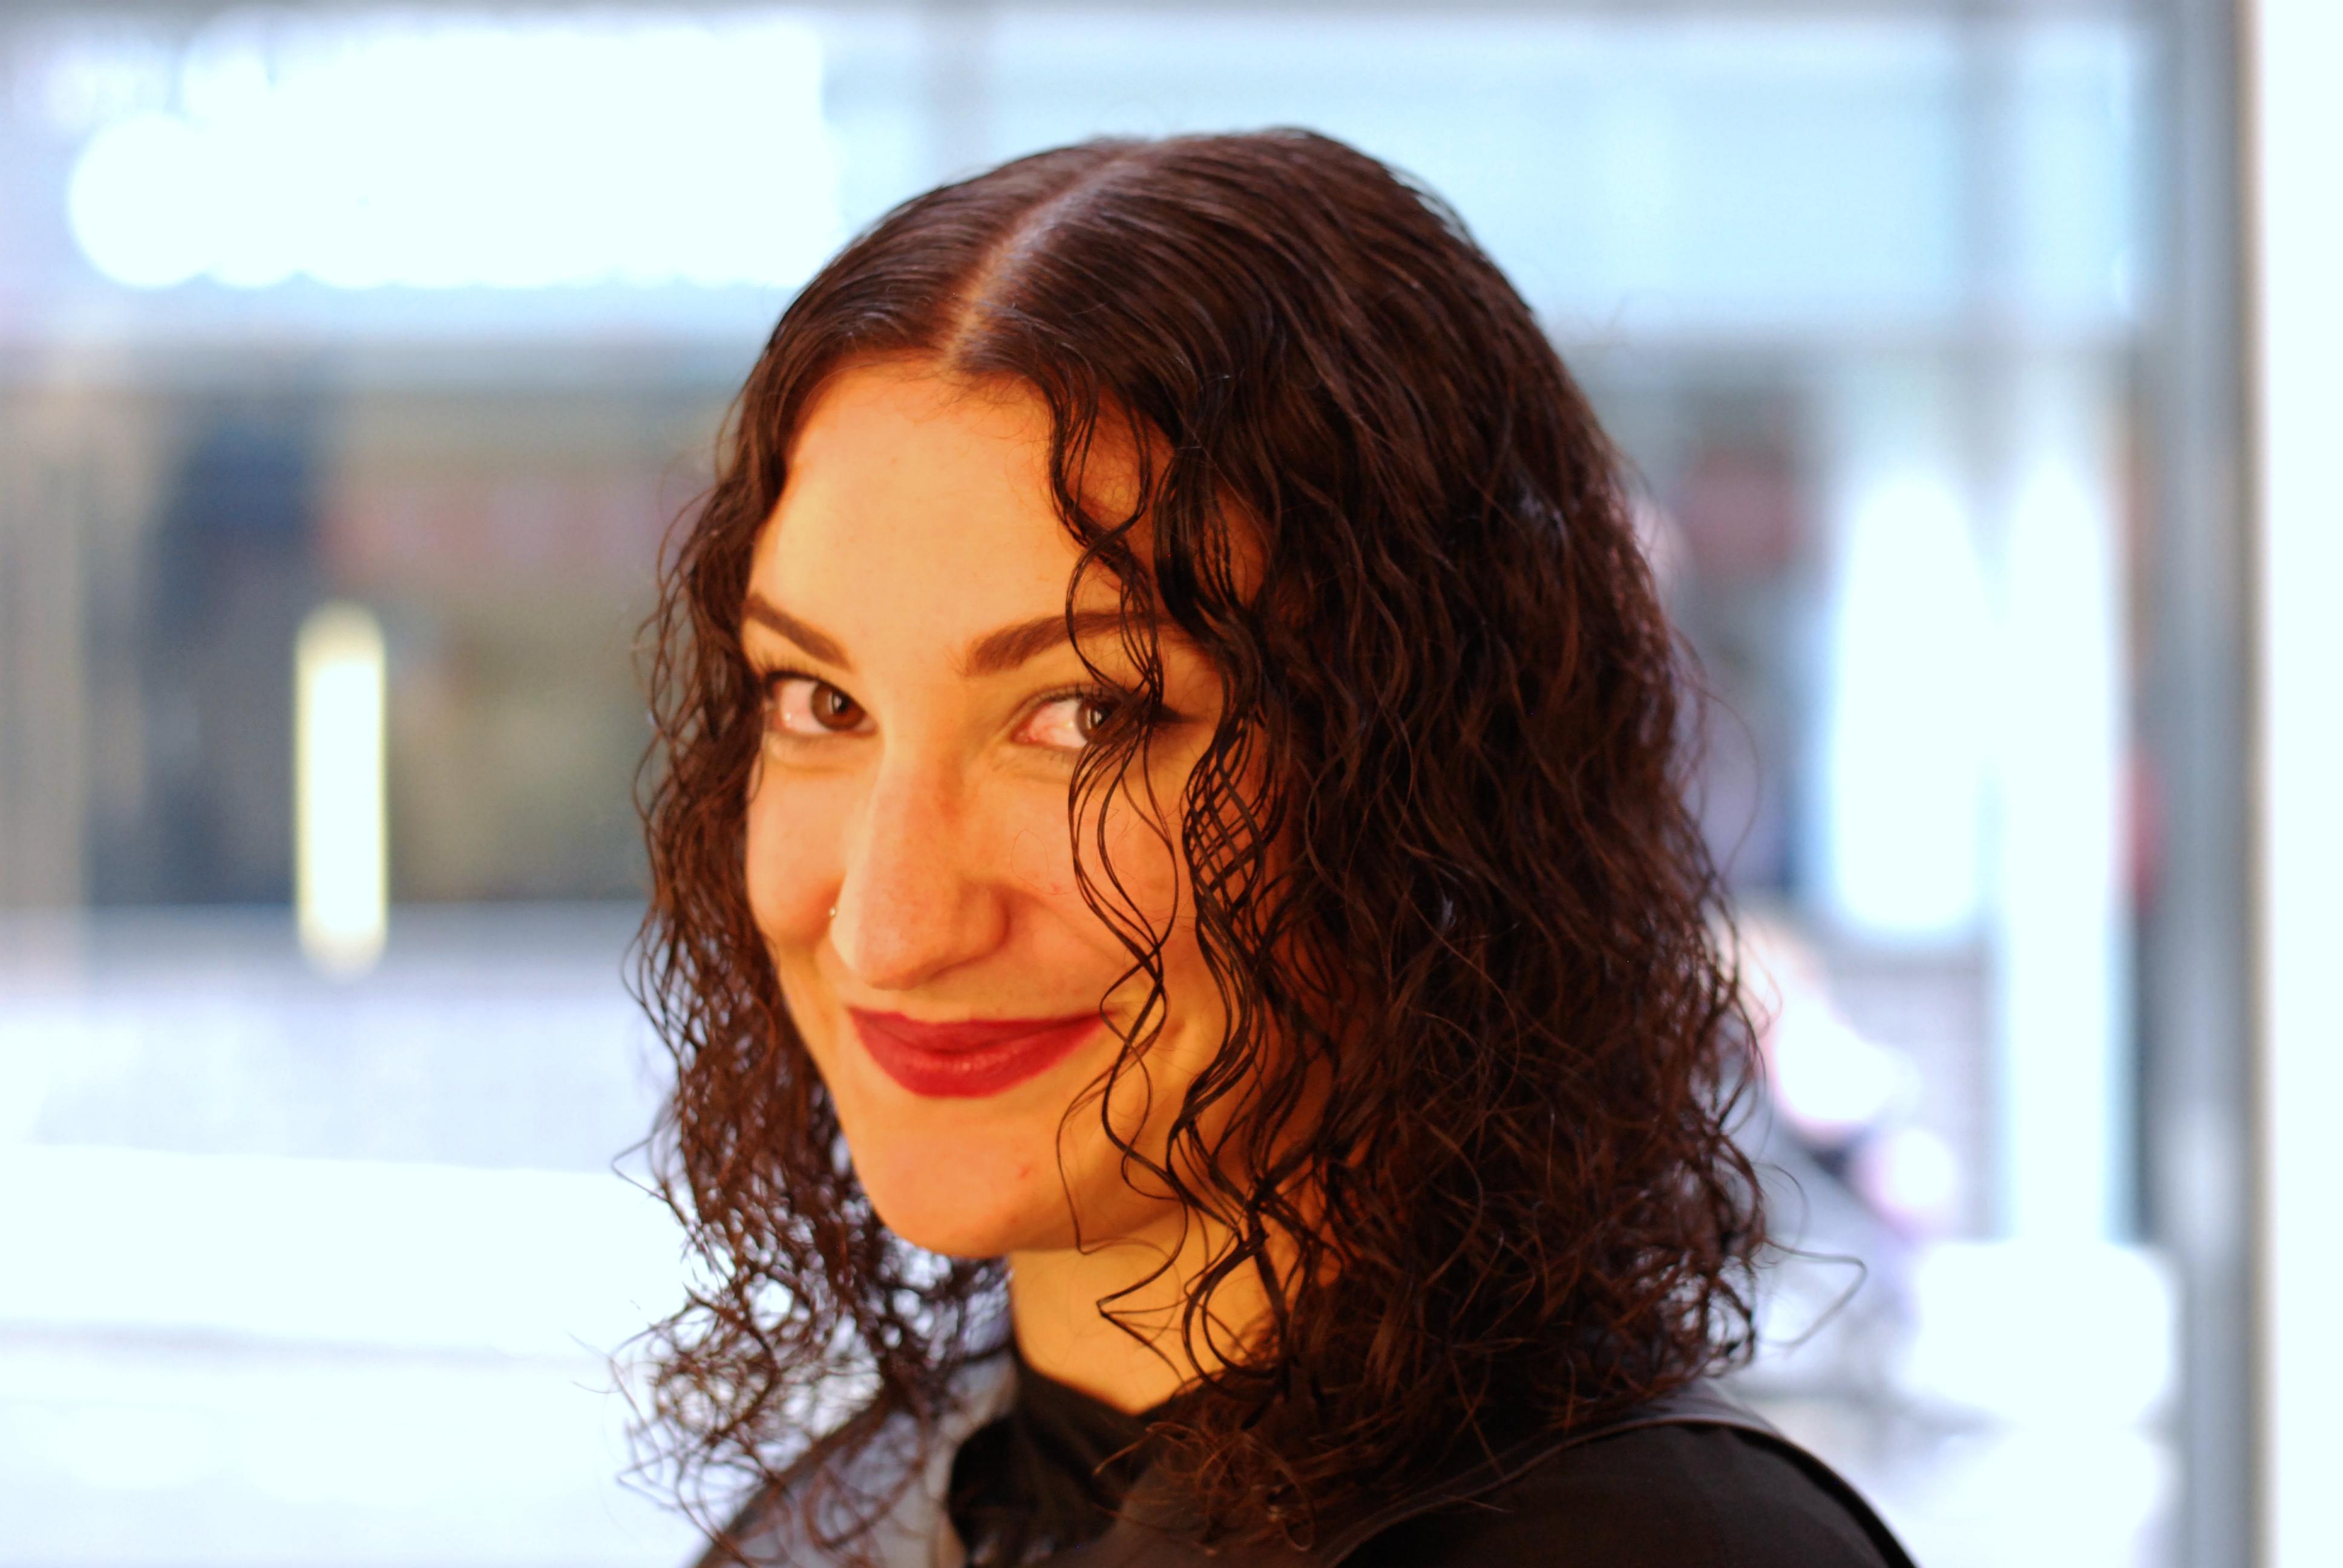 Beauty headmasters hair salon brighton review for Curly hair salon uk